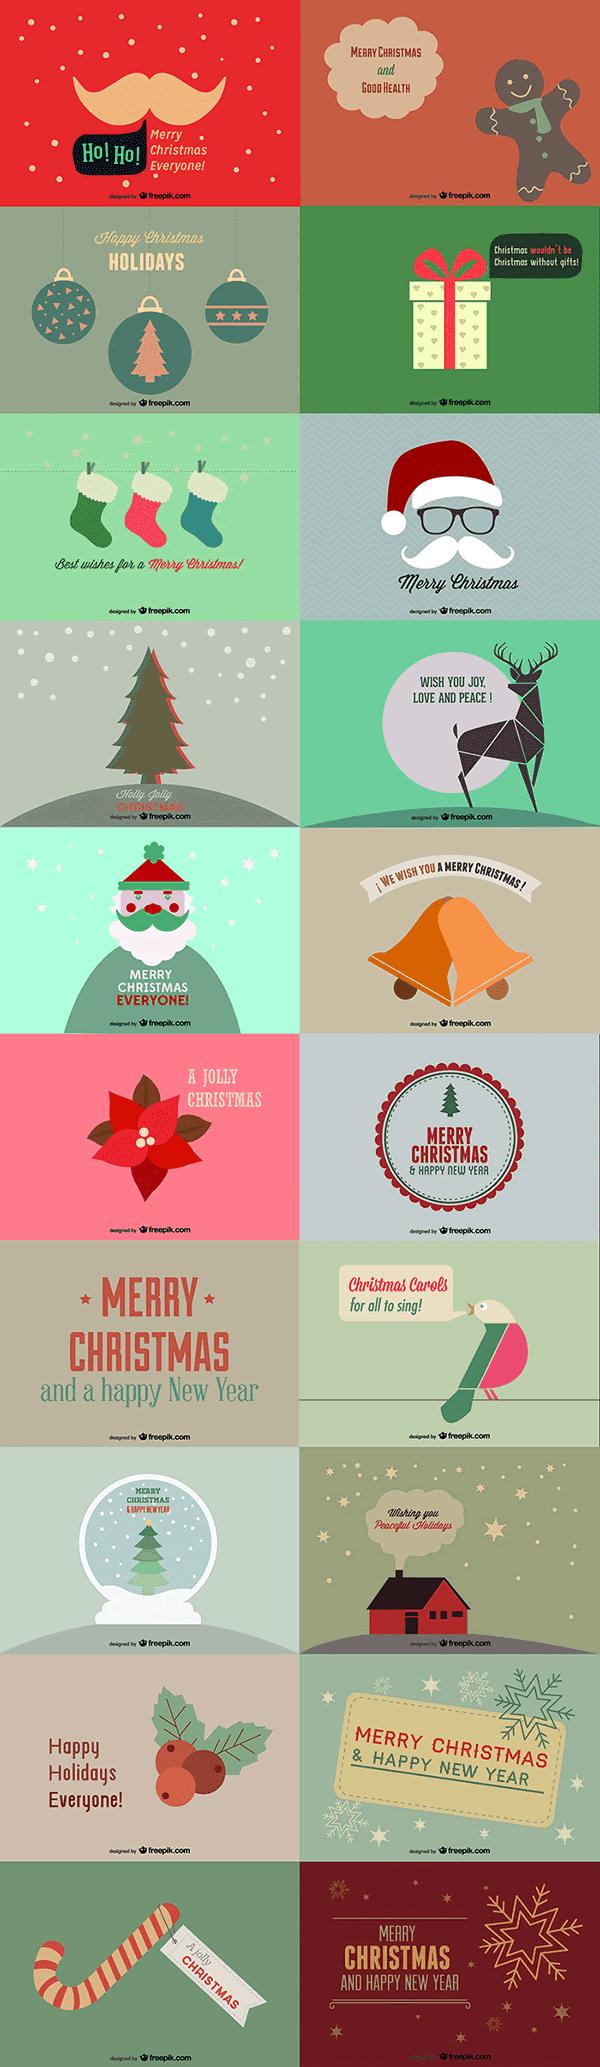 9. 20 Beautiful Christmas Cards